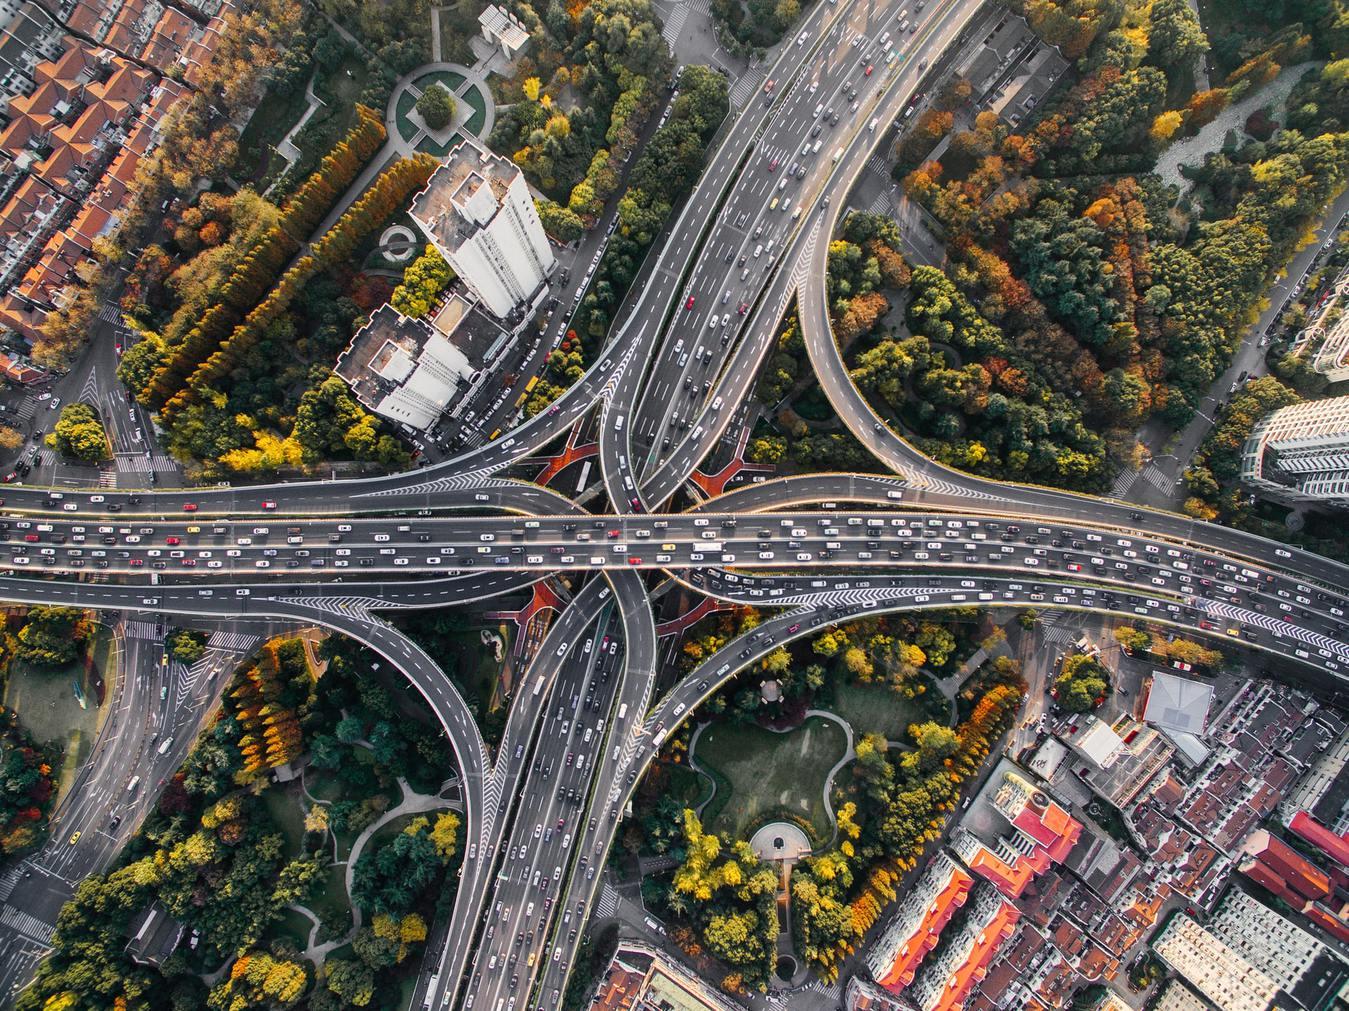 Persimpangan jalan dari atas ketinggian